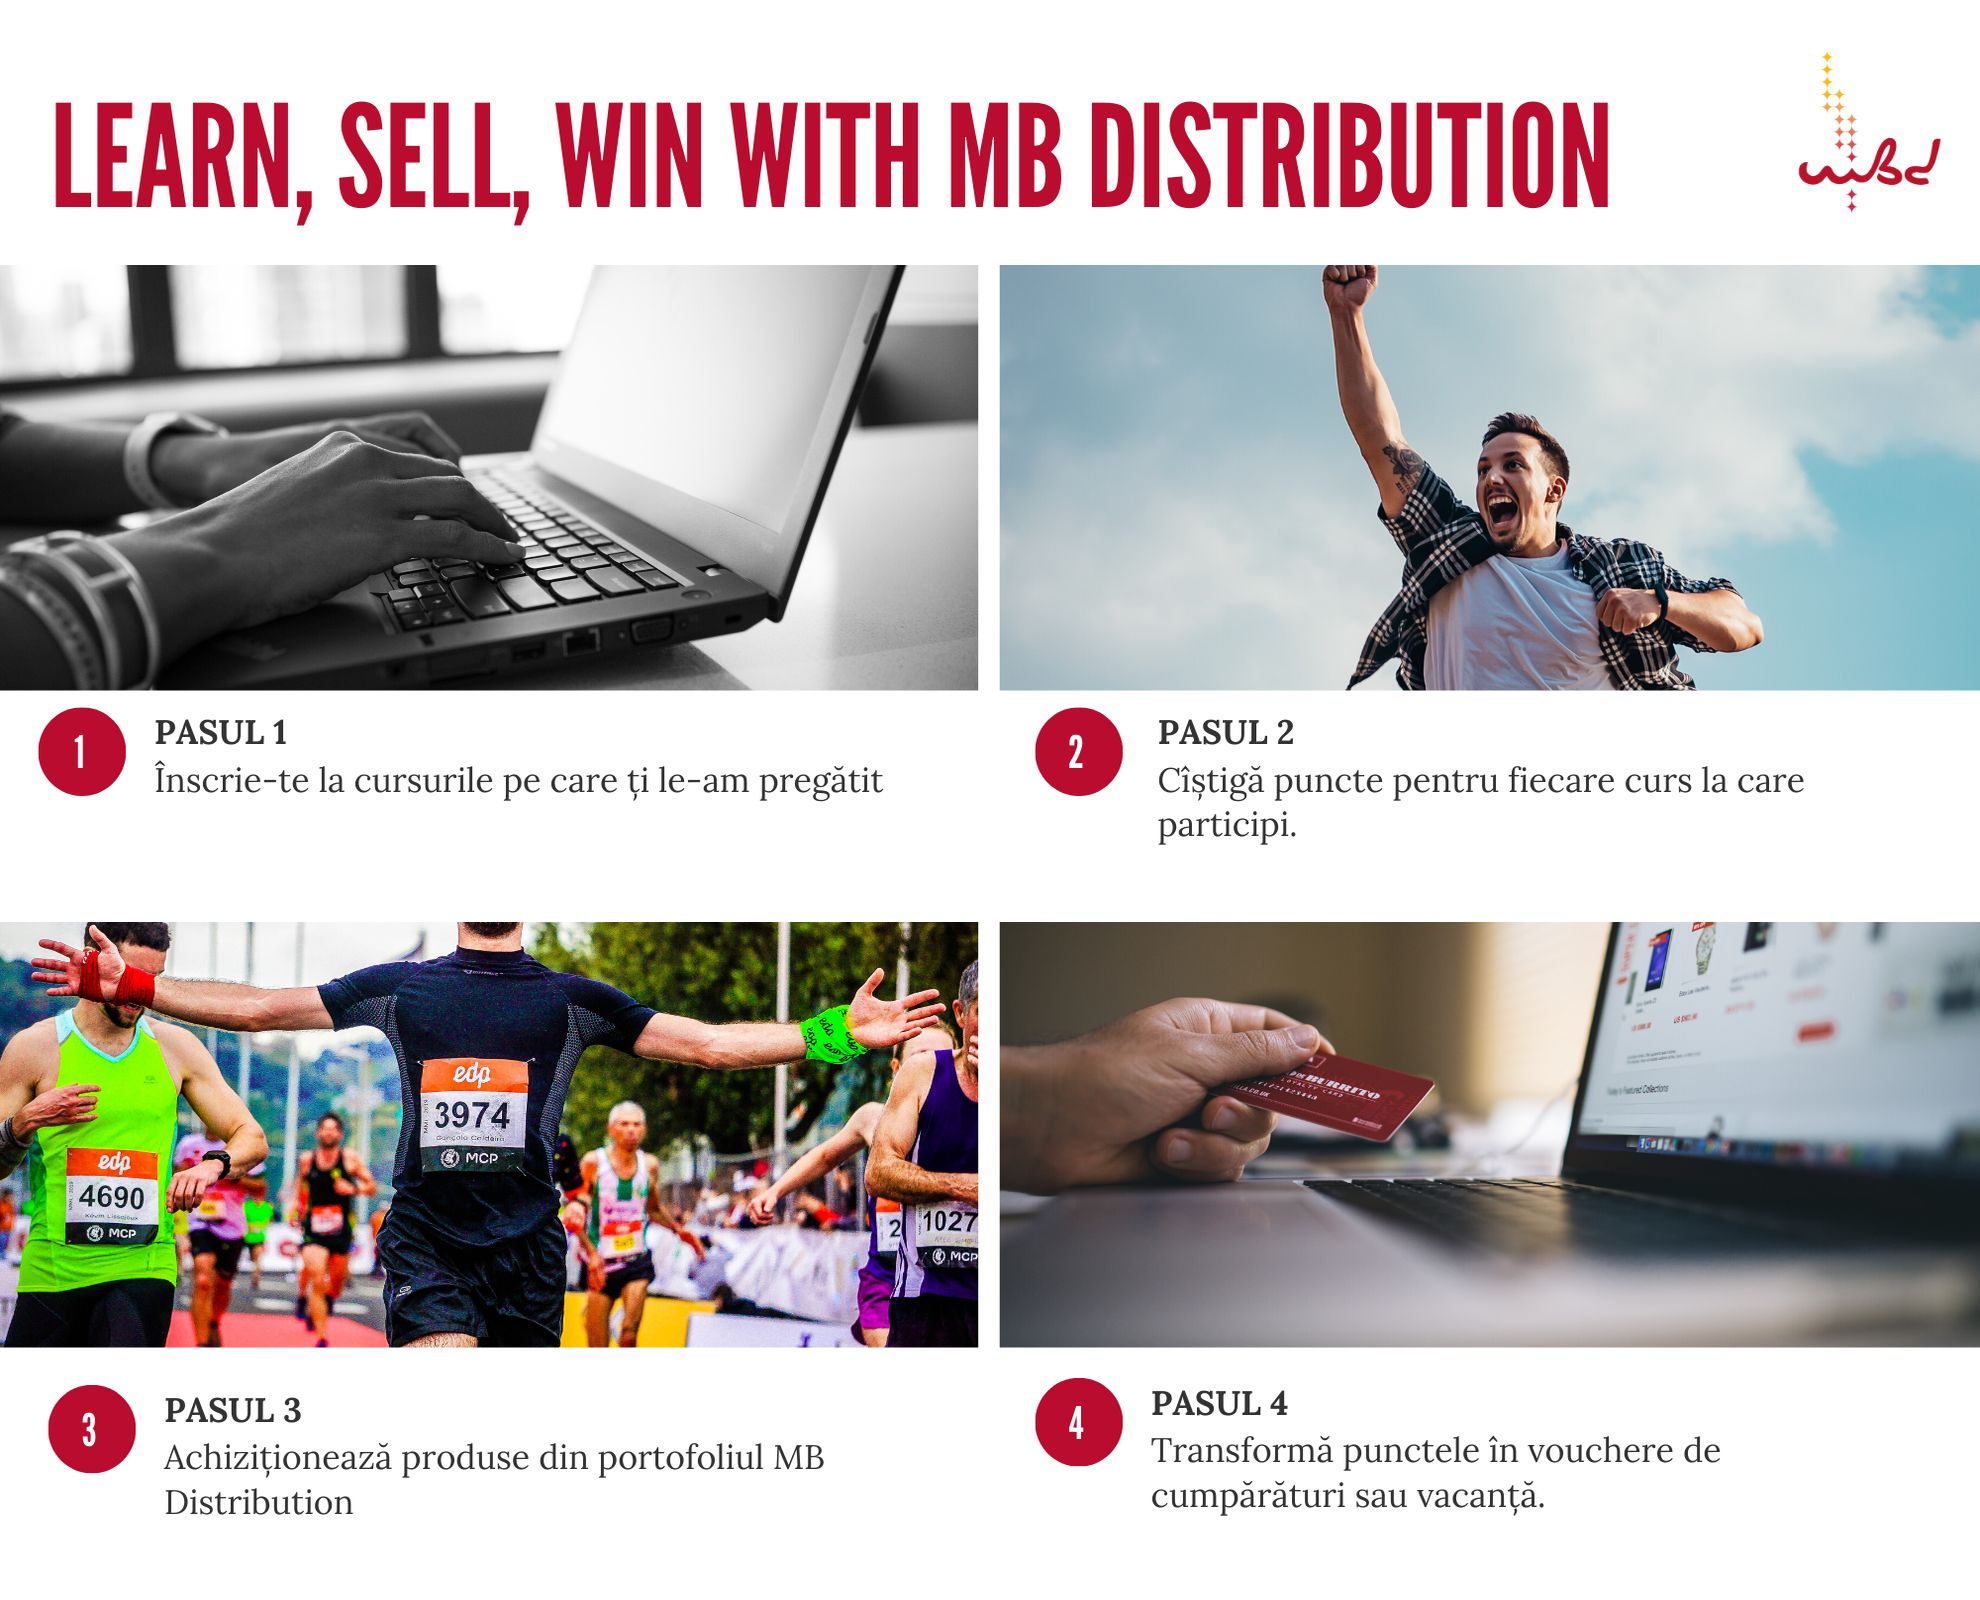 Learn, sell, win